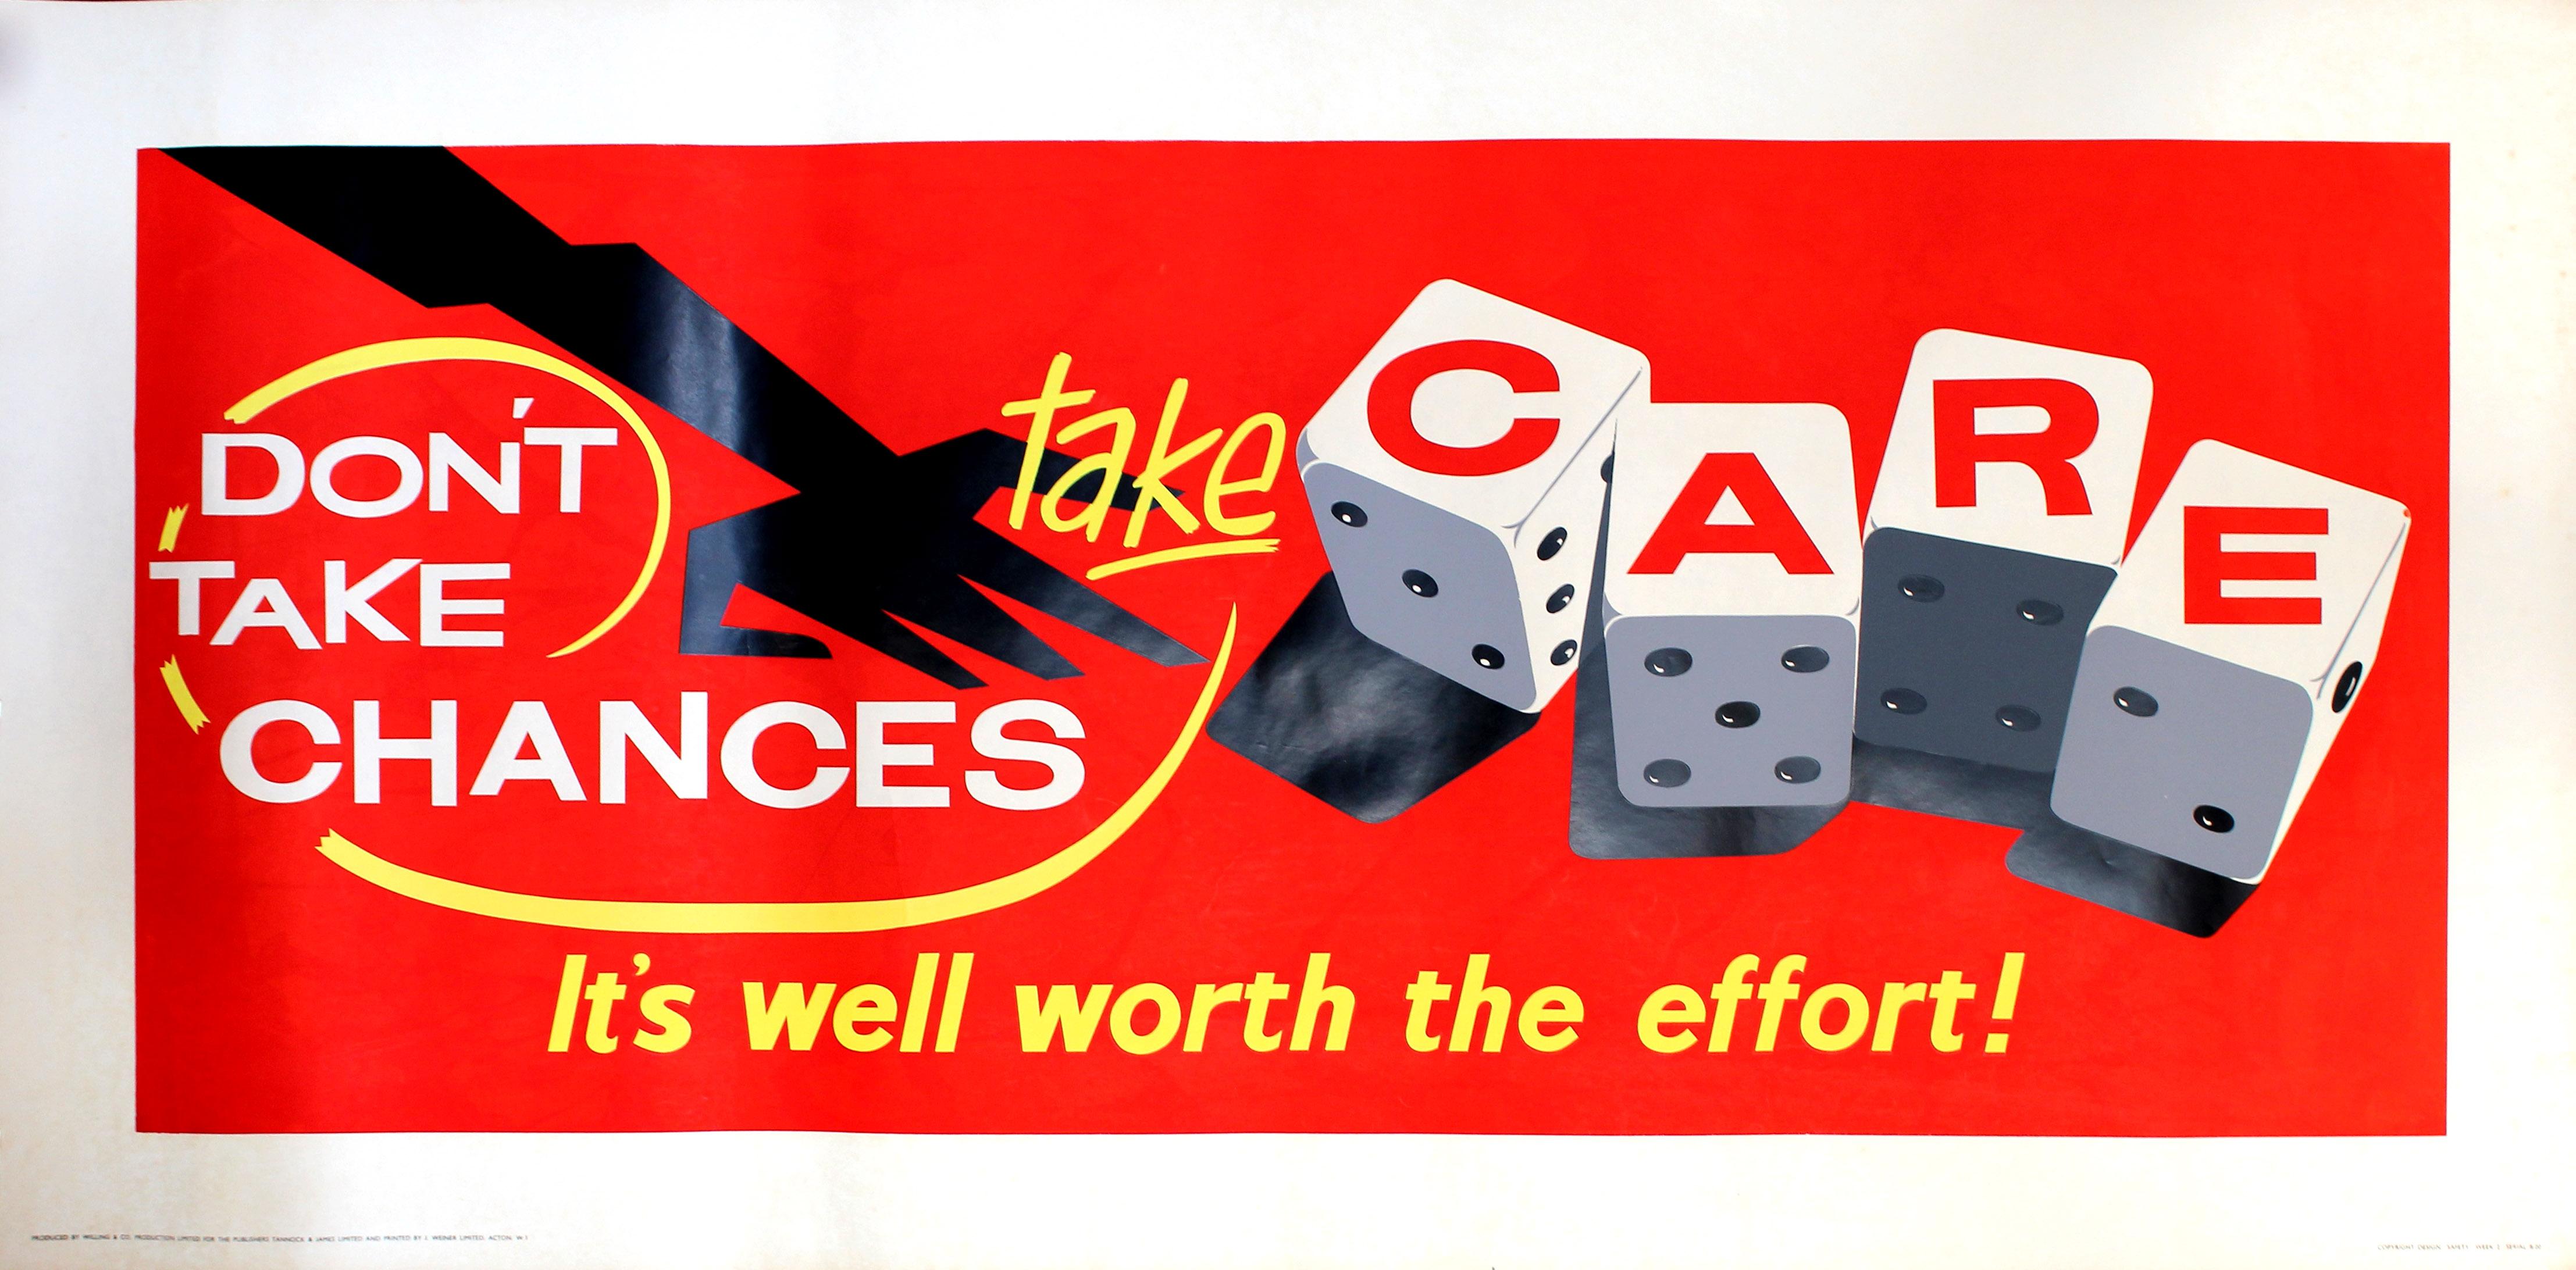 Lot 55 - Propaganda Poster Workplace Motivation Gambling Dice Chances